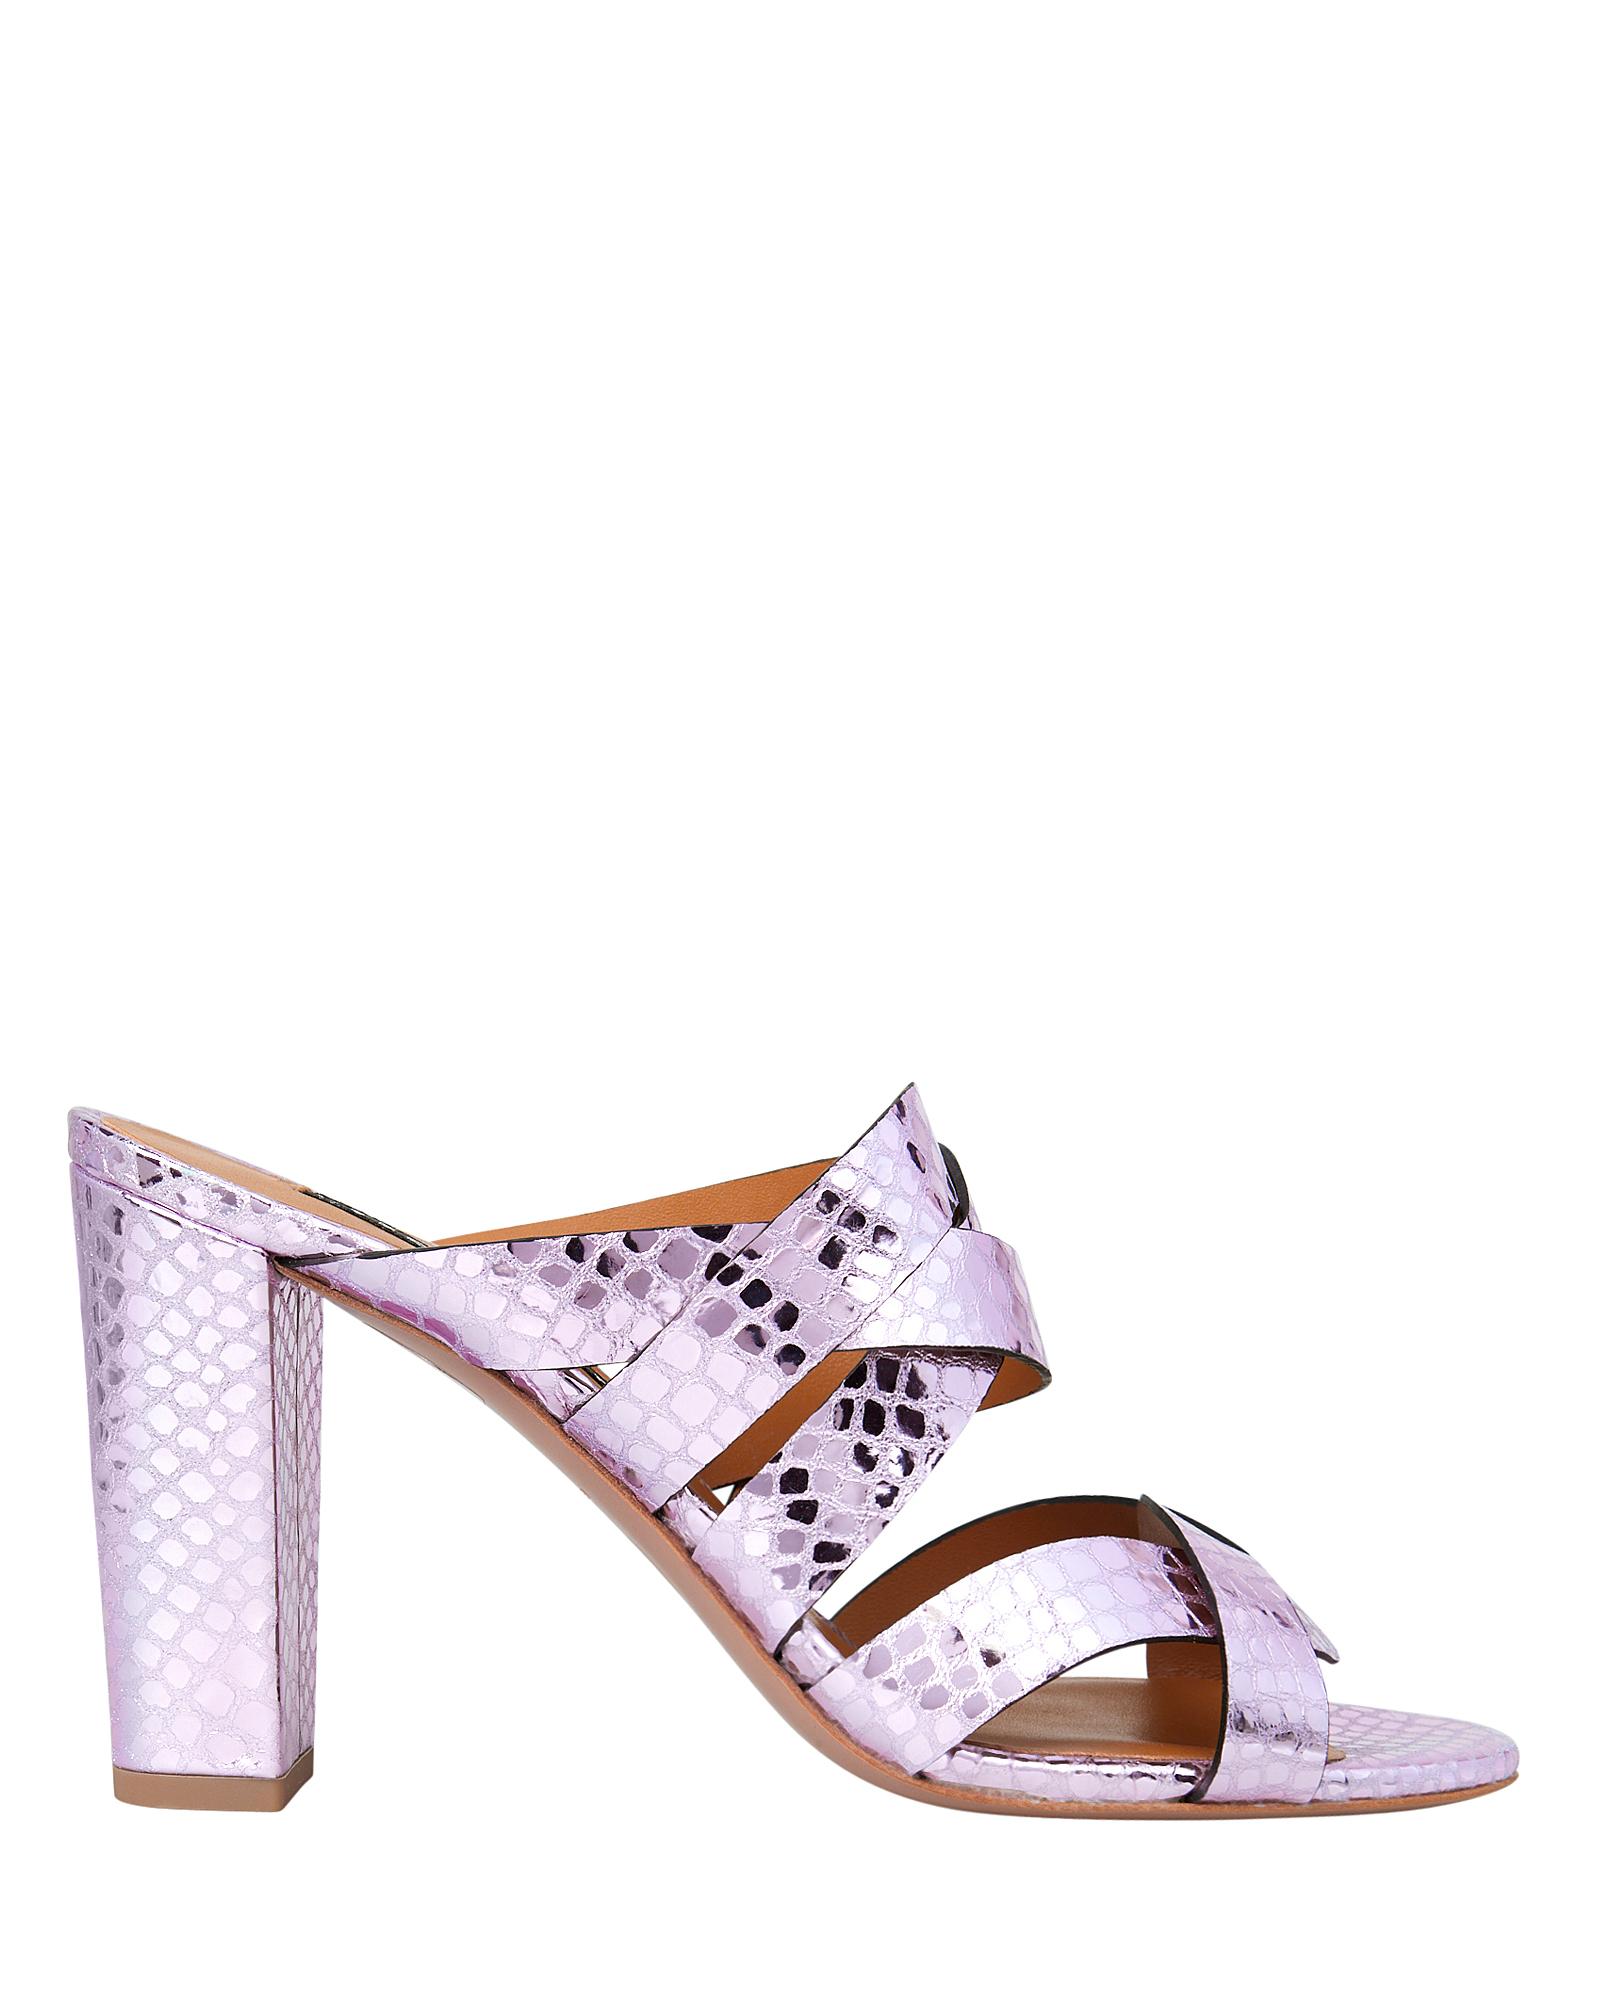 Veronica Beard Sandals Macey Slide Embossed Sandals